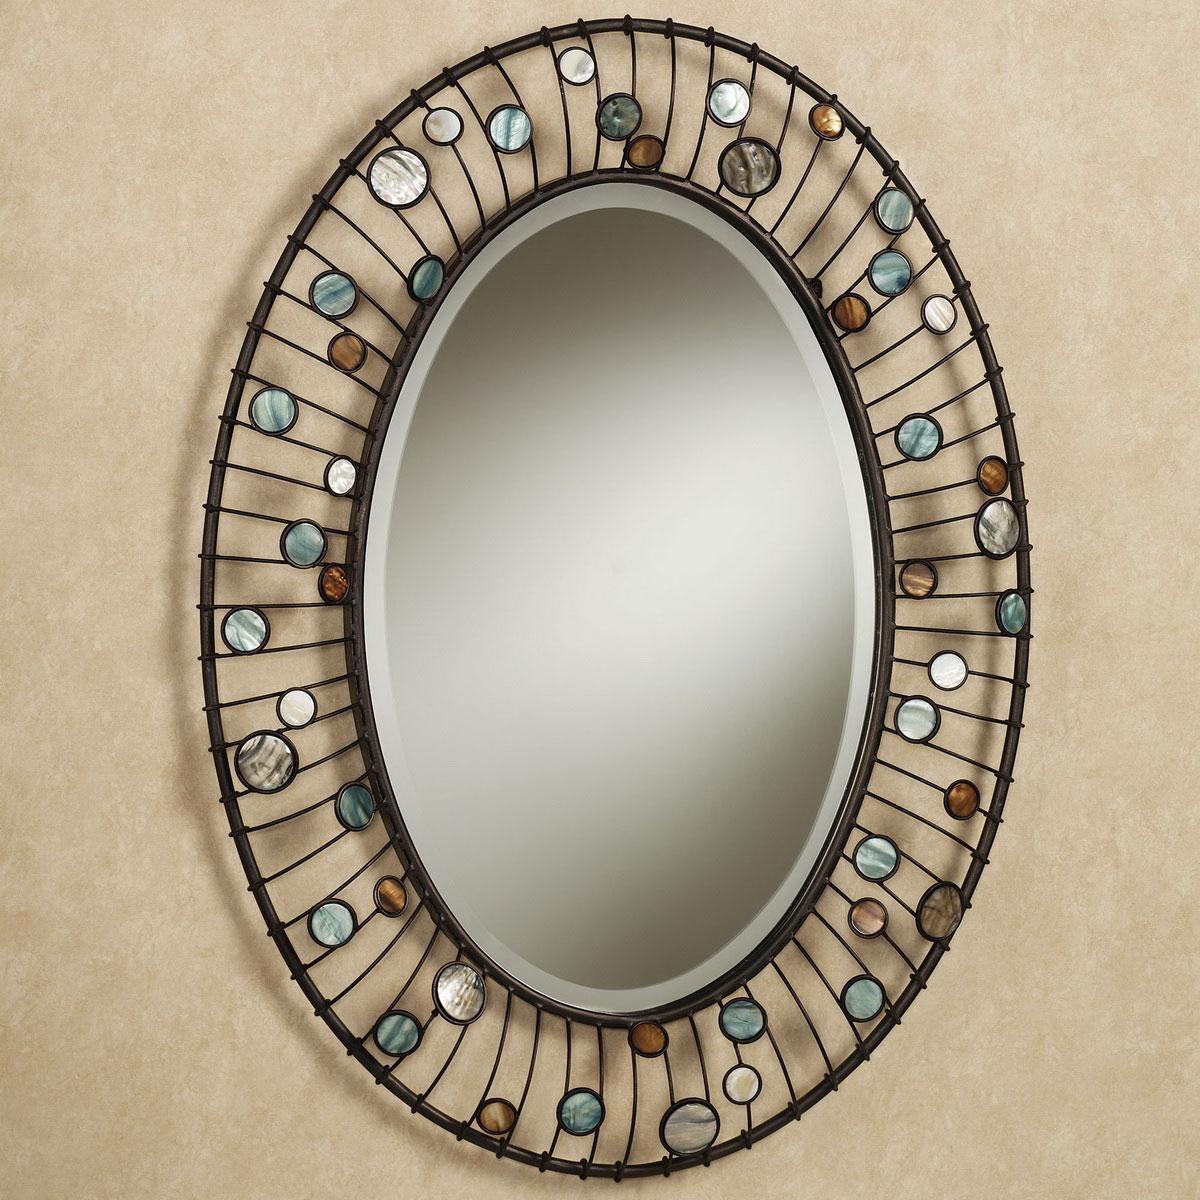 Decorative Bathroom Mirrors | Bathroom Decorating Ideas With Oval Bath Mirrors (View 19 of 20)